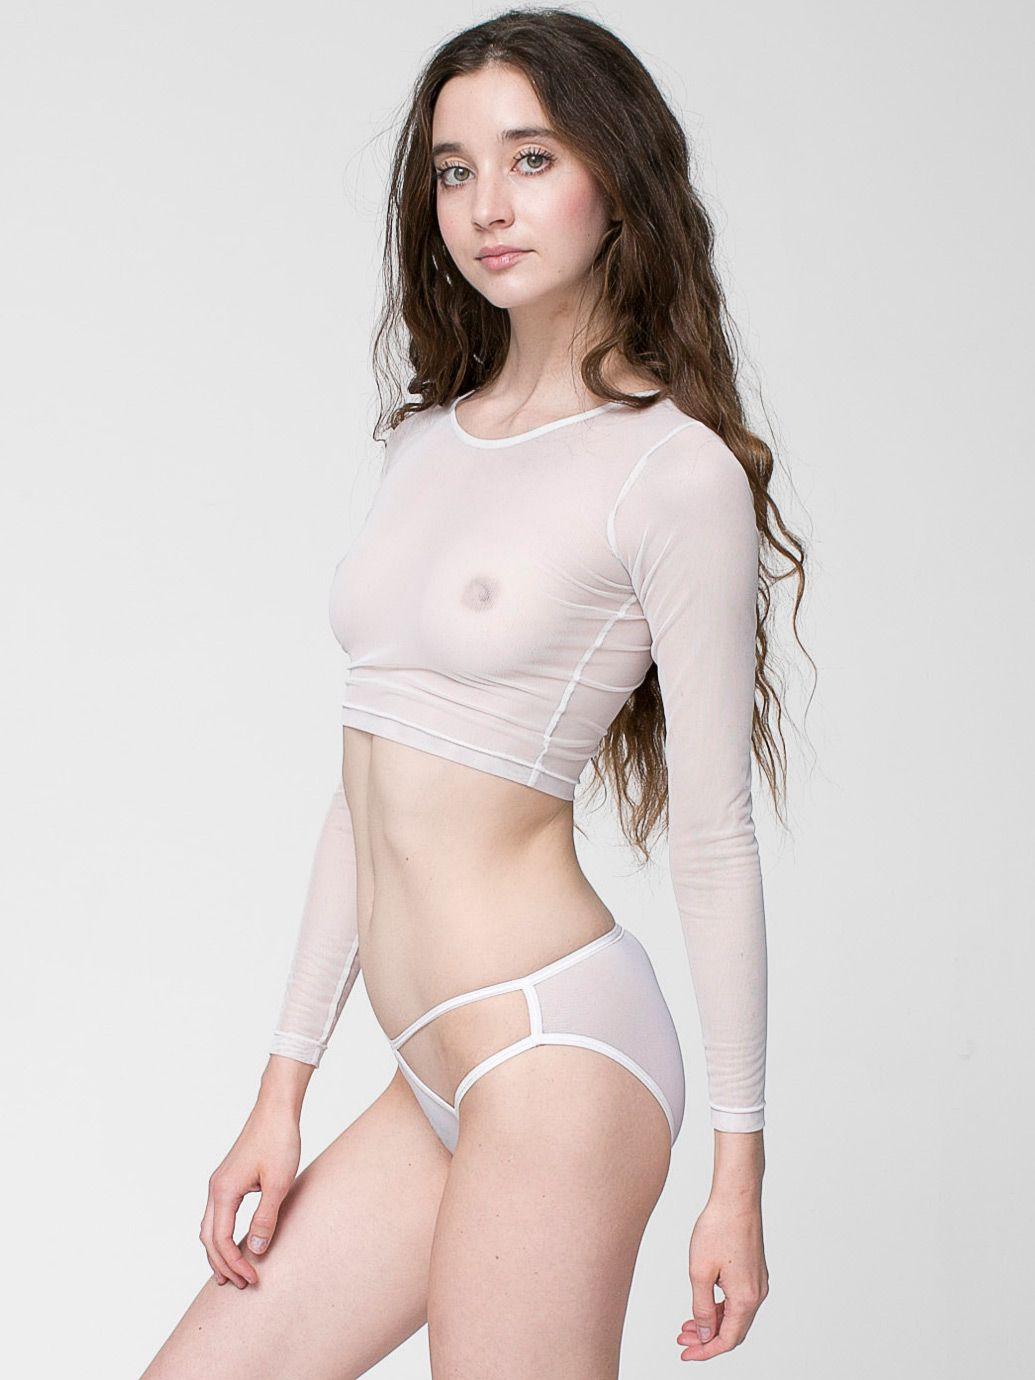 Free mature lesbo porn